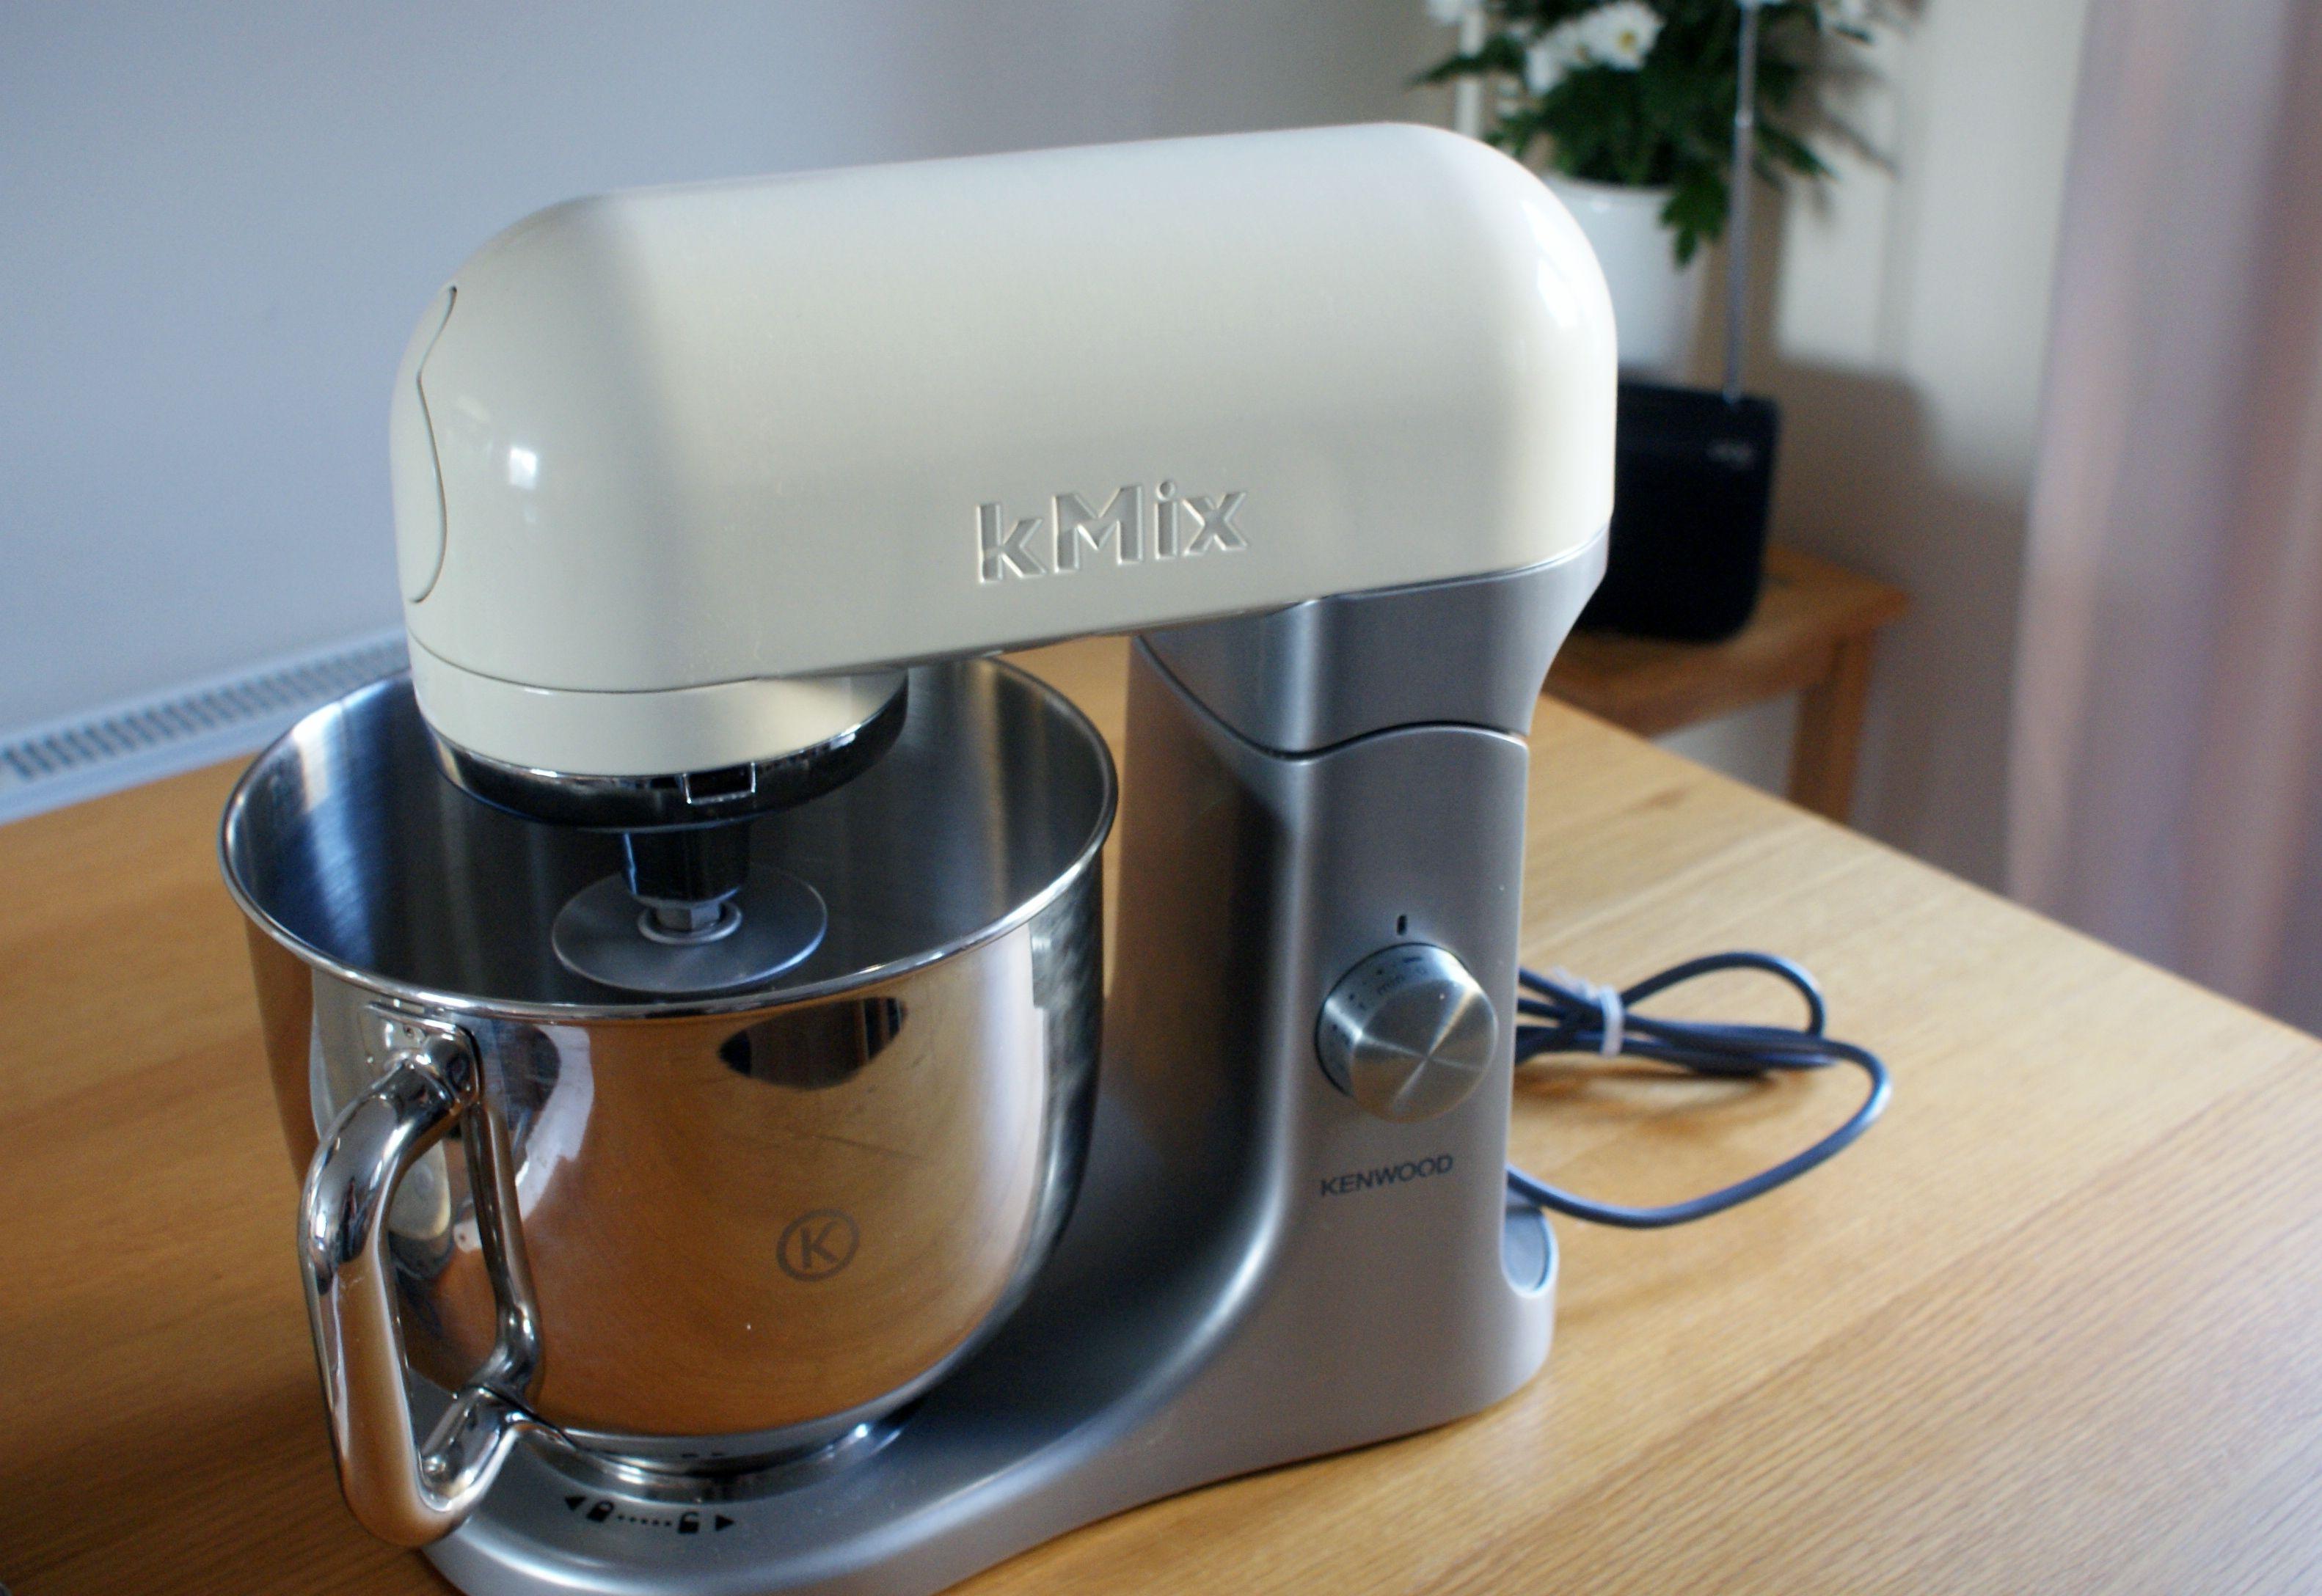 Batidora Amasadora Kenwood Kmix Kitchen Aid Mixer Kitchen Aid Kitchen Appliances